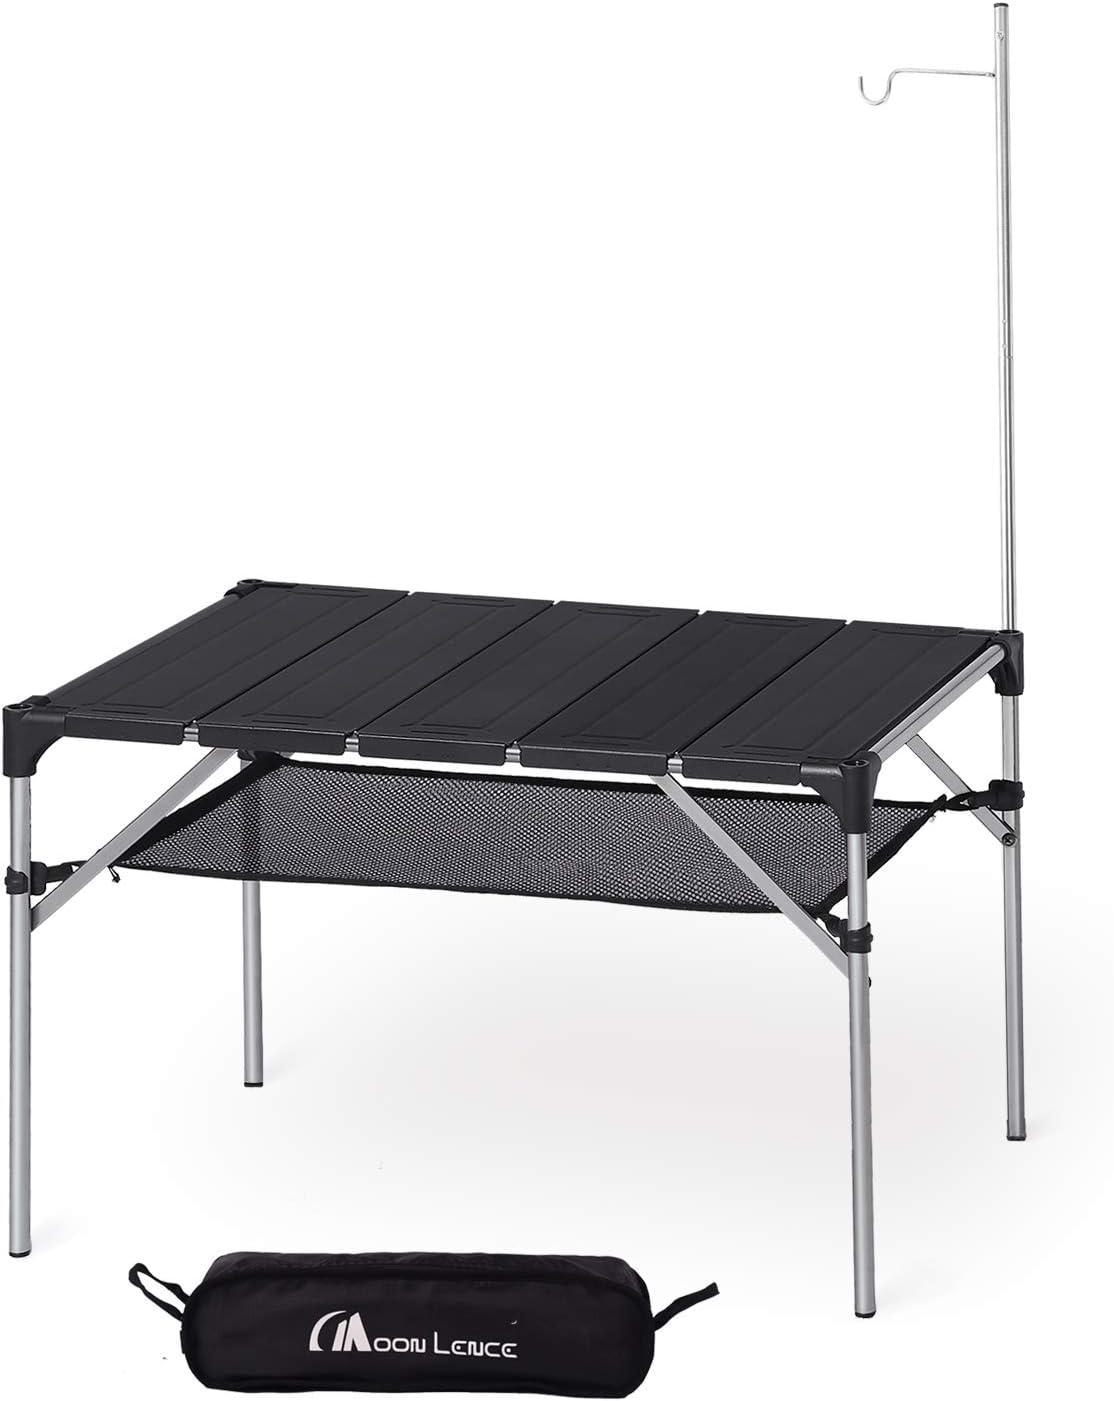 Amazon   Moon Lence キャンプ テーブル アルミ ロールテーブル アウトドア ハイキング BBQ 折りたたみ式 コンパクト 超軽量…   MOON LENCE   テーブル